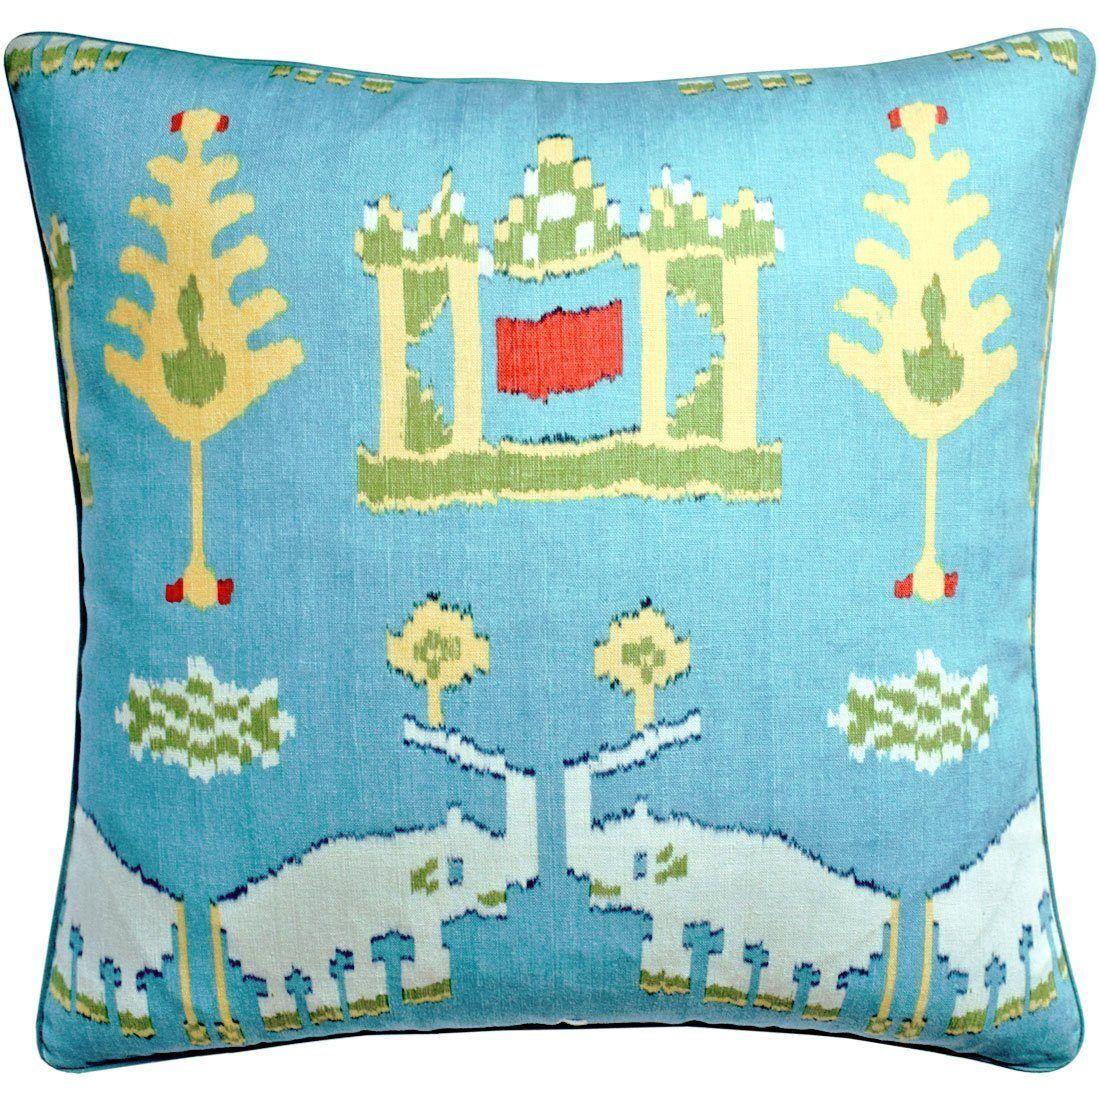 Ryan Studio Kingdom Parade Turquoise Decorative Pillow